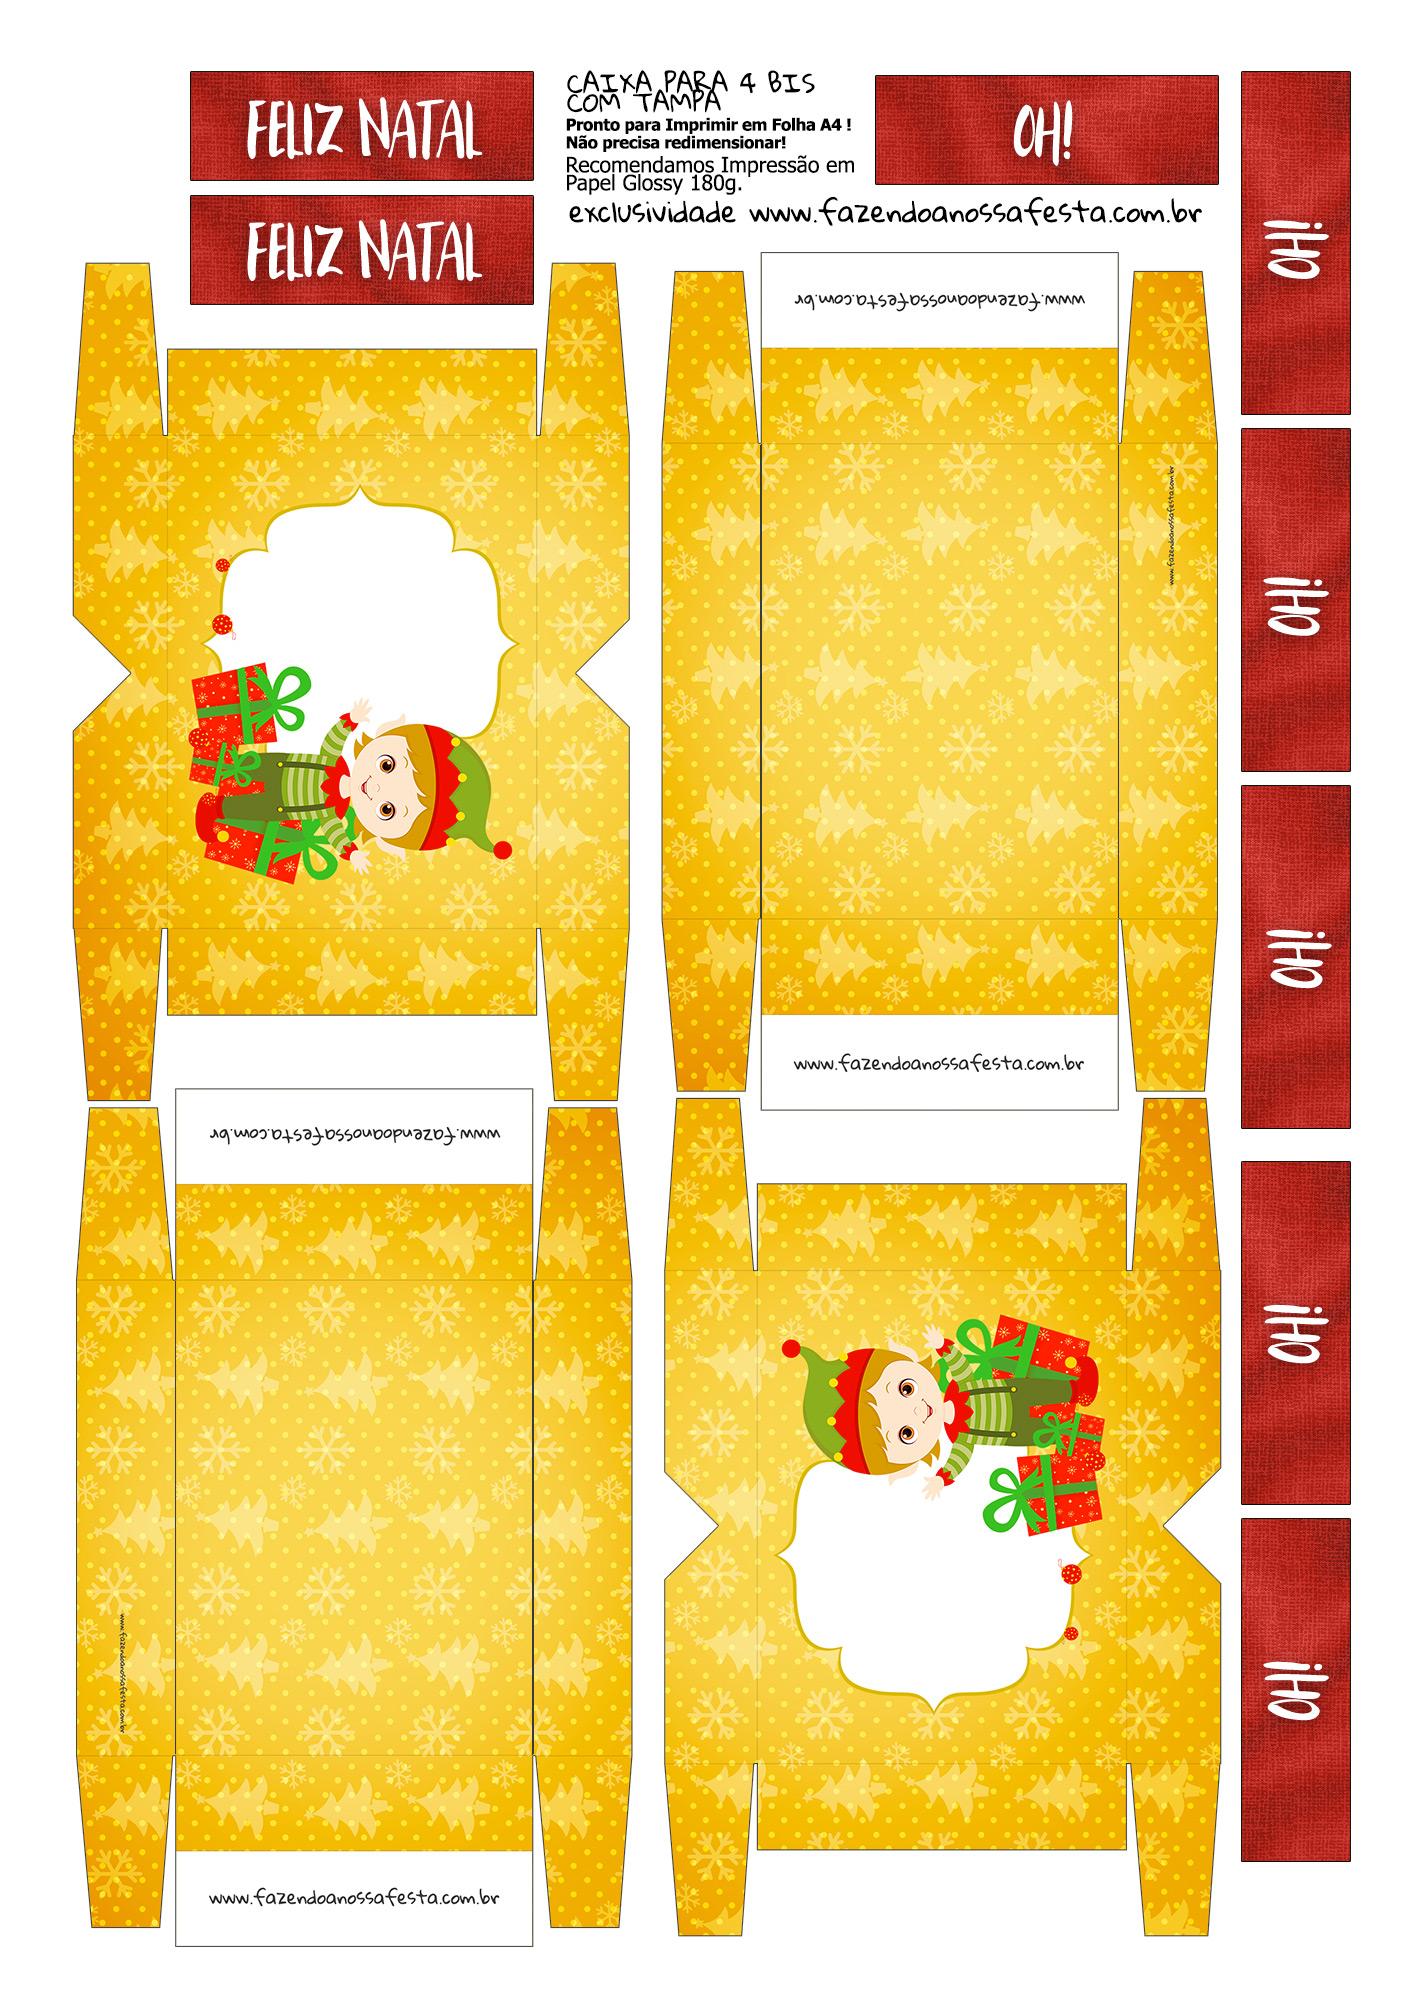 Lembrancinha para Natal Caixa 4 Bis 9